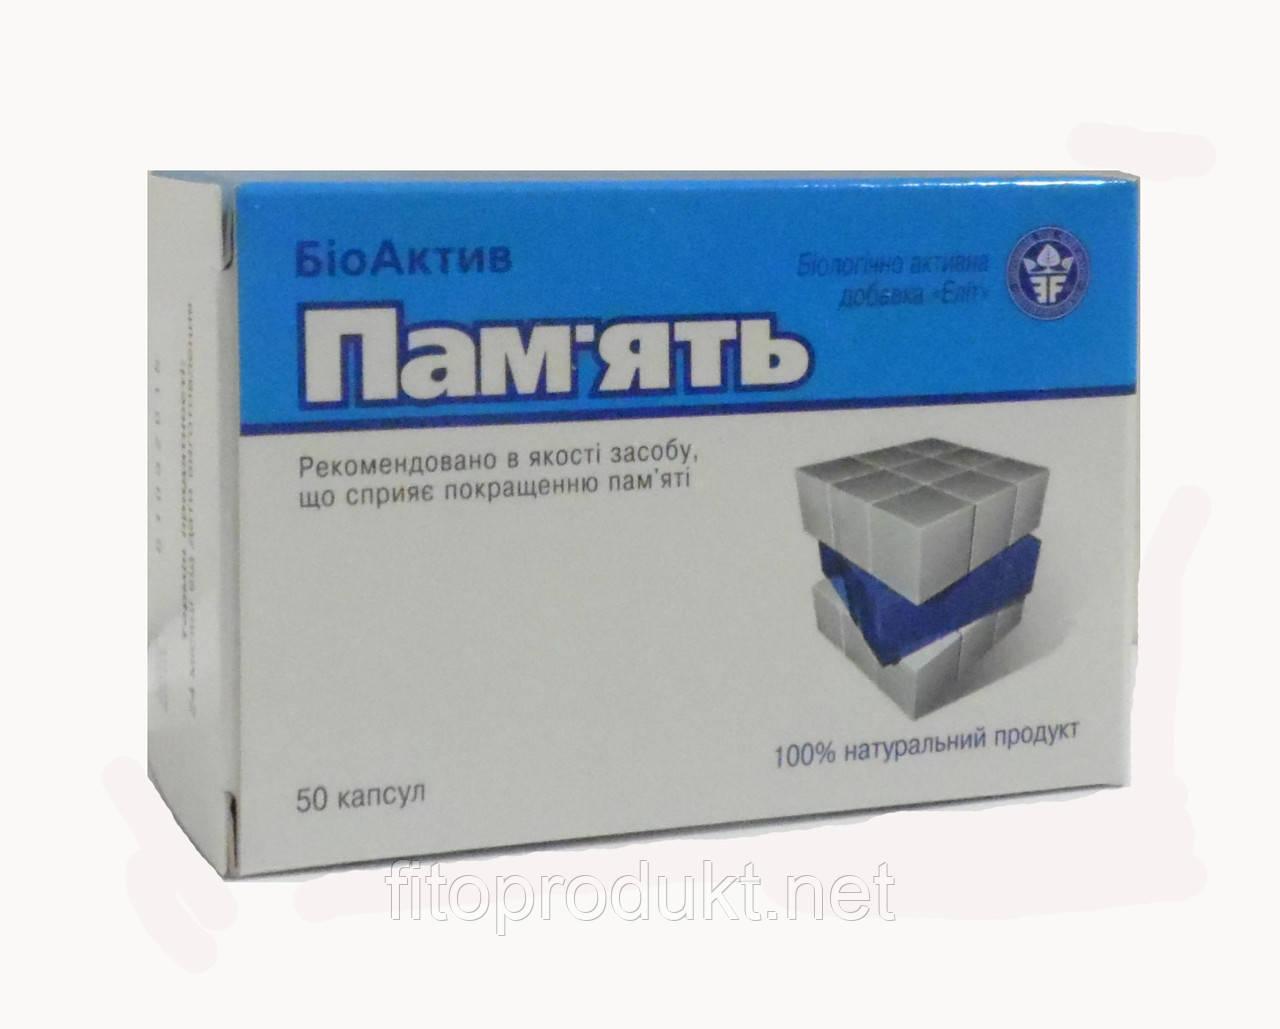 Память биоактив  препарат на основе трав Элит Фарм